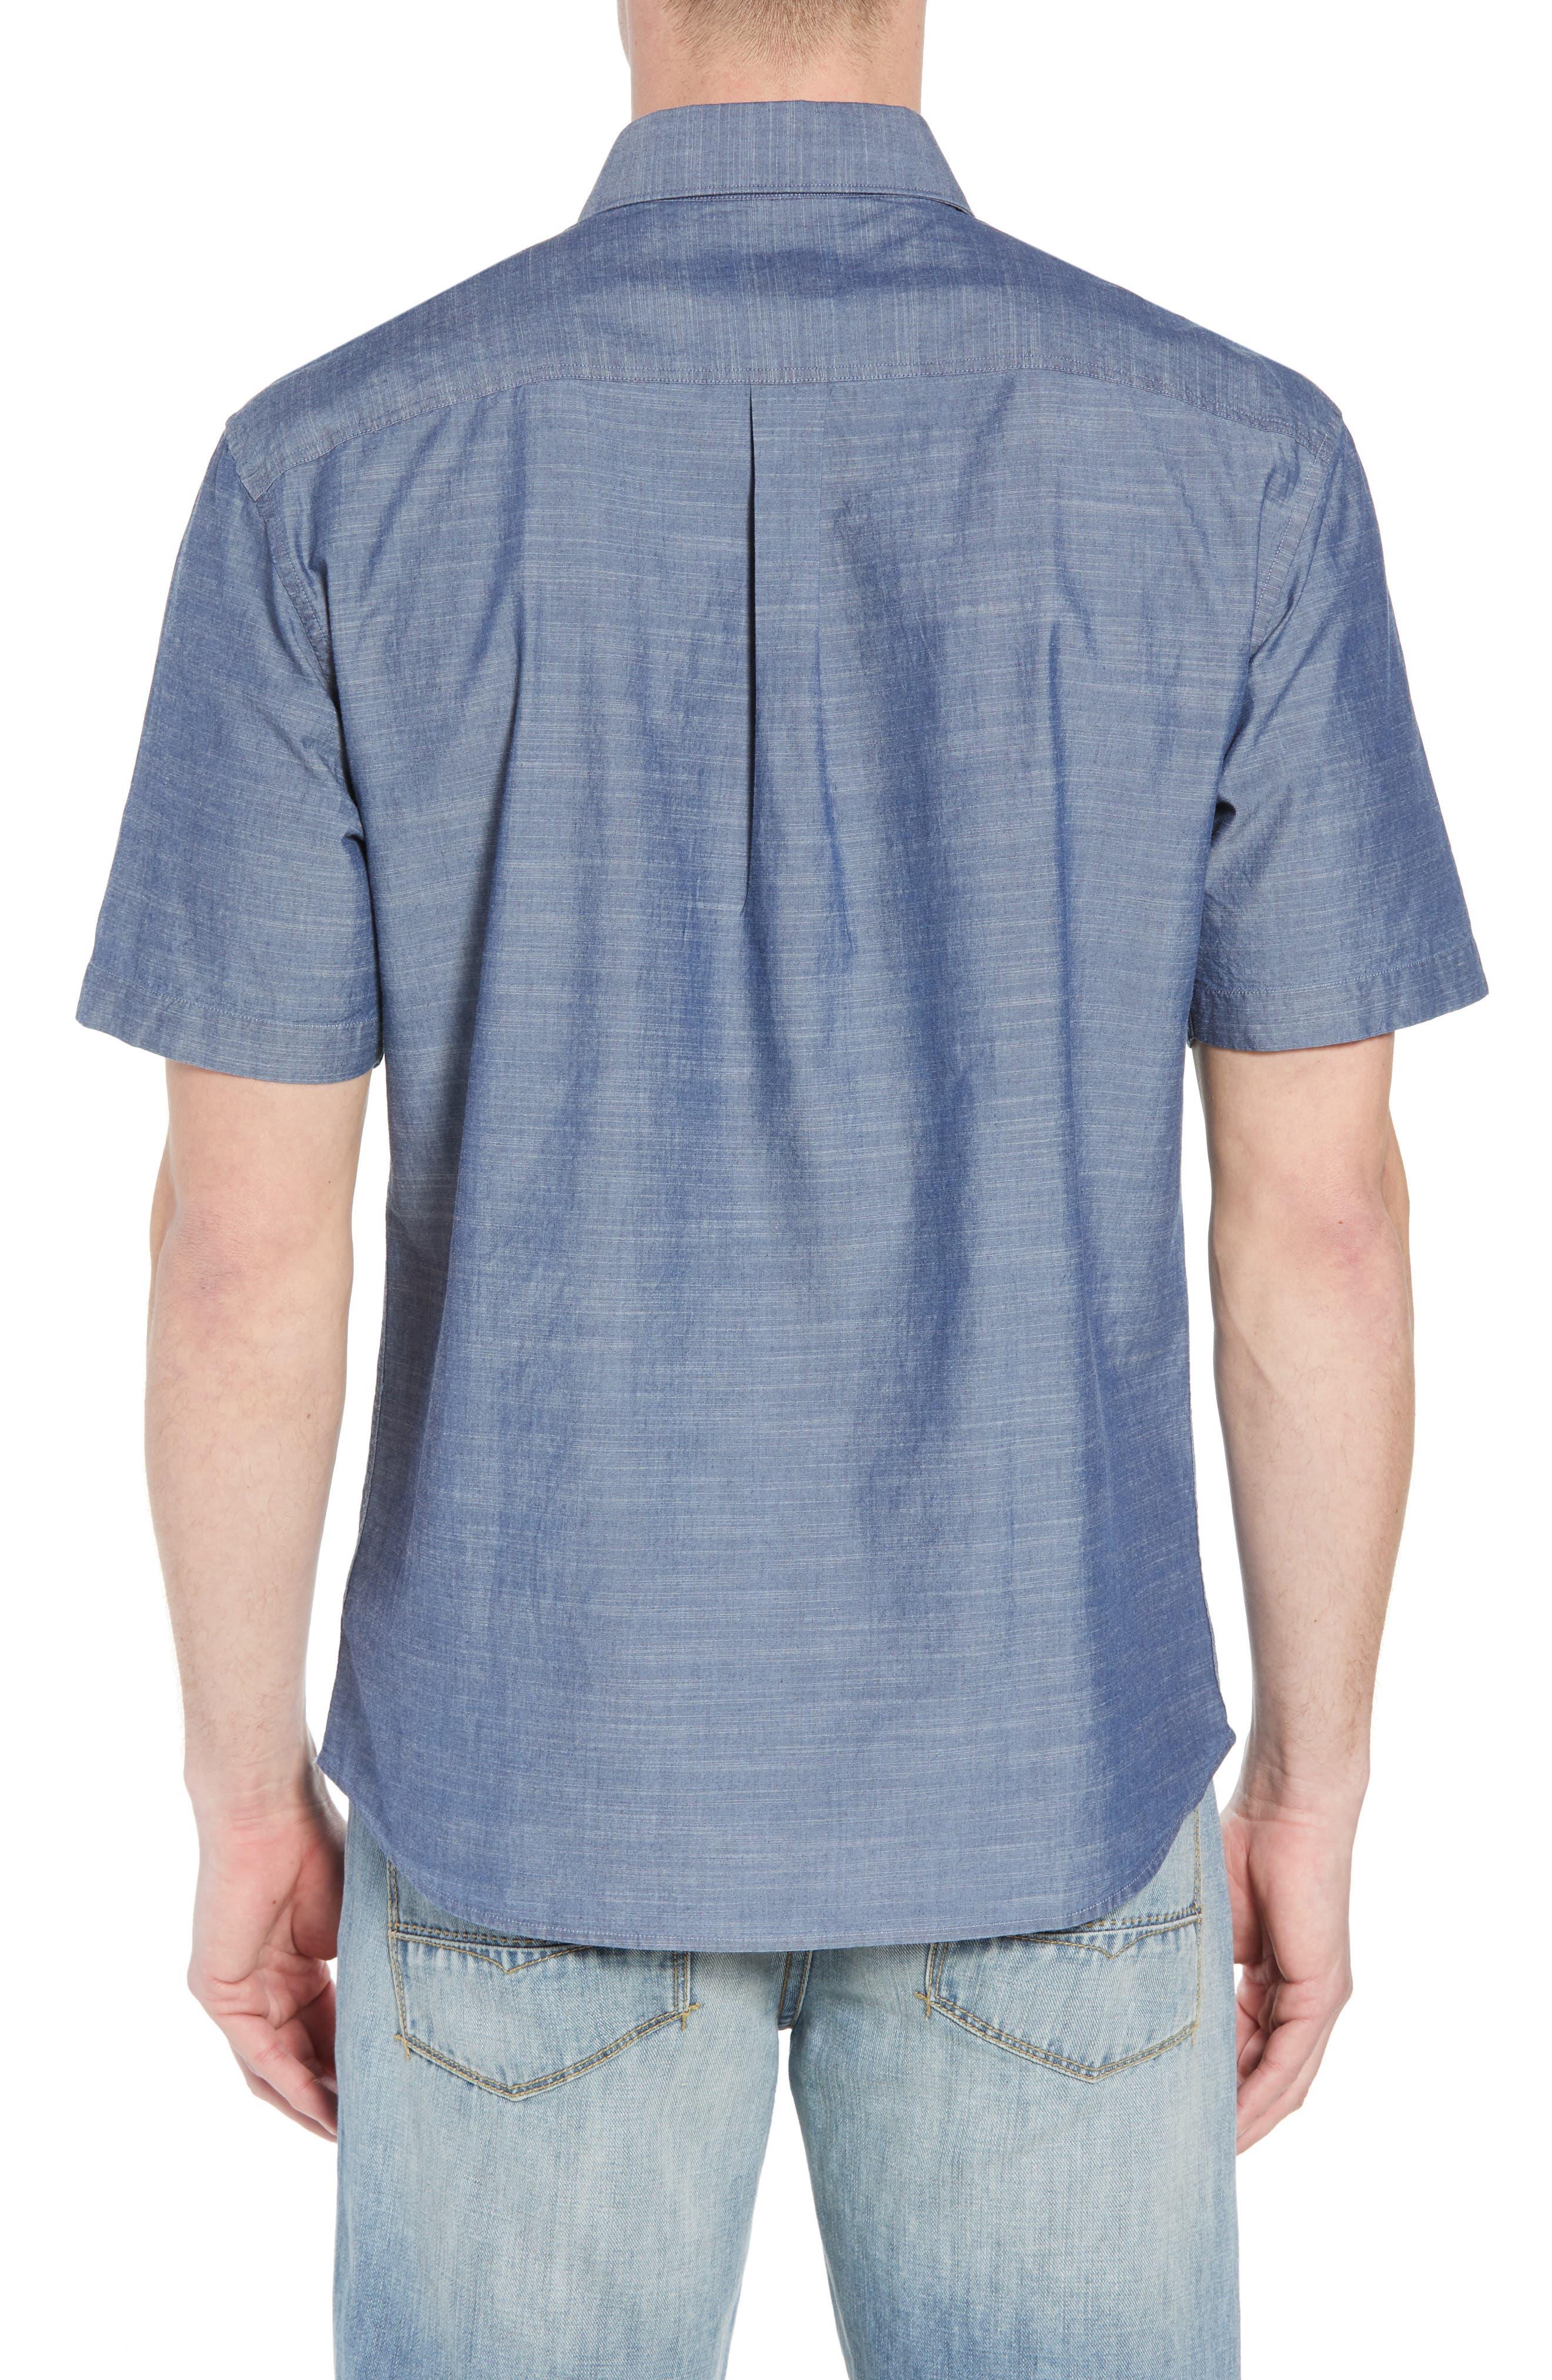 Lucas Regular Fit Chambray Sport Shirt,                             Alternate thumbnail 2, color,                             INDIGO